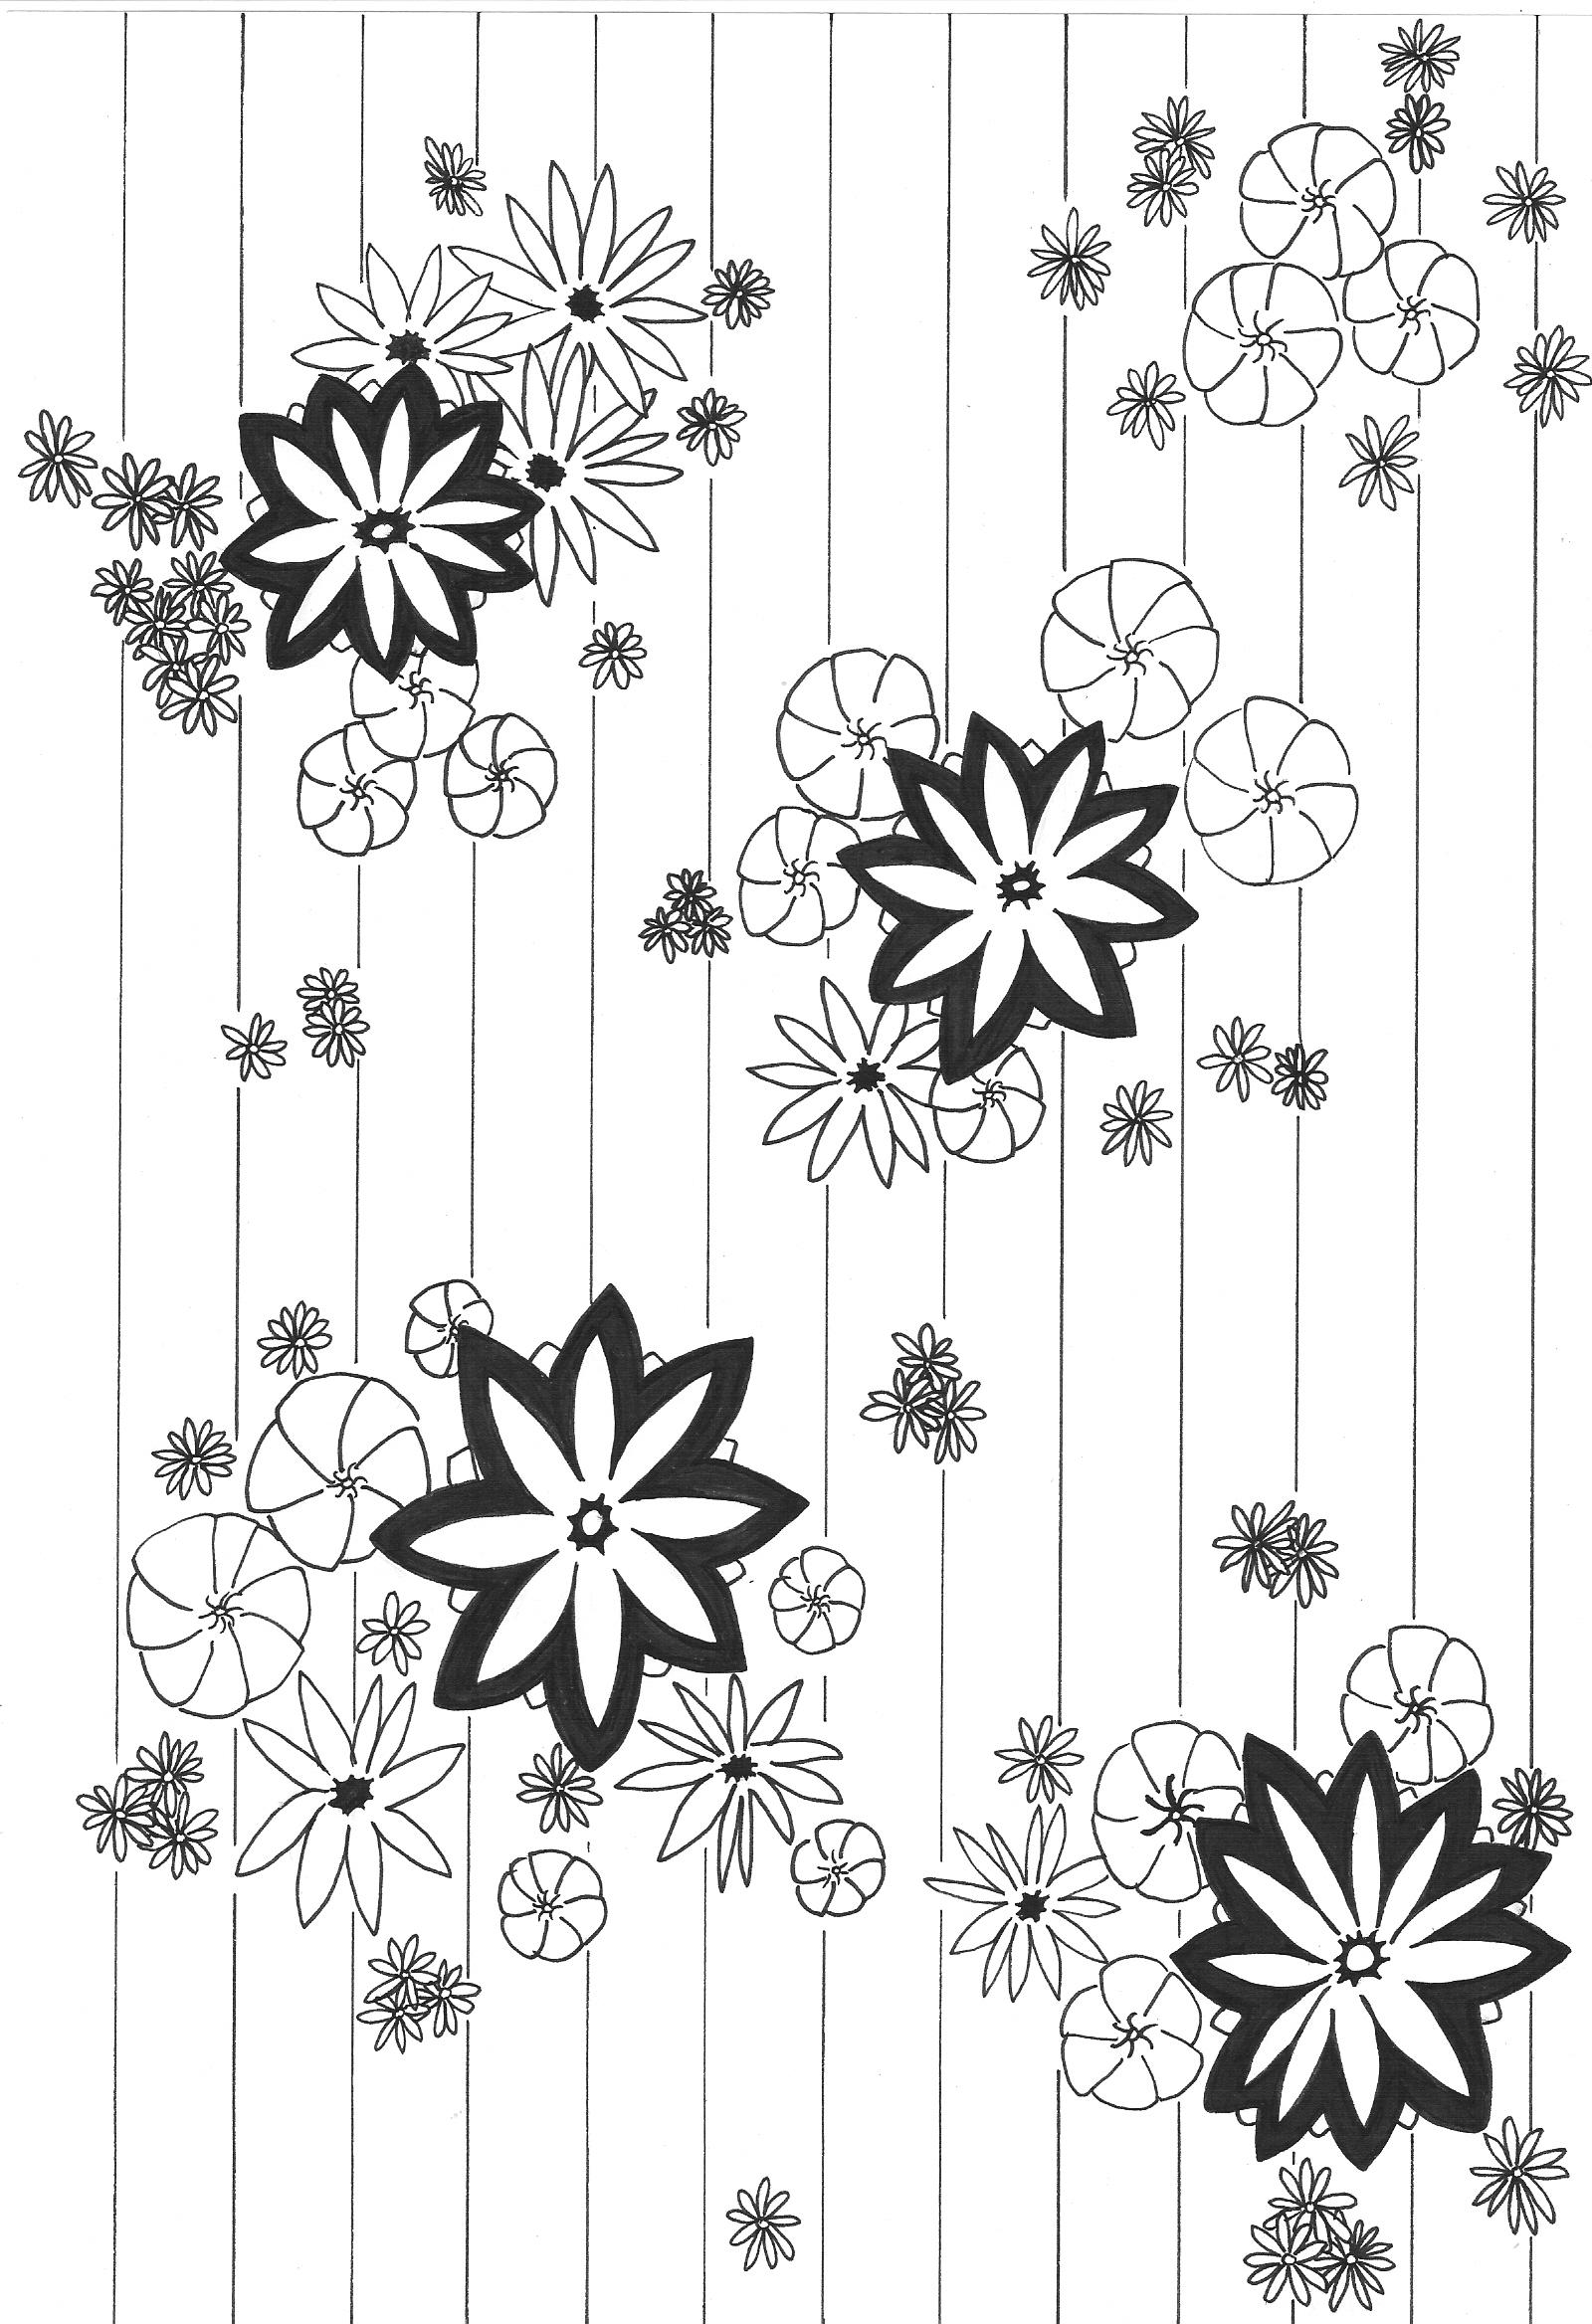 Design Patterns Book Gang Of Four Pdf